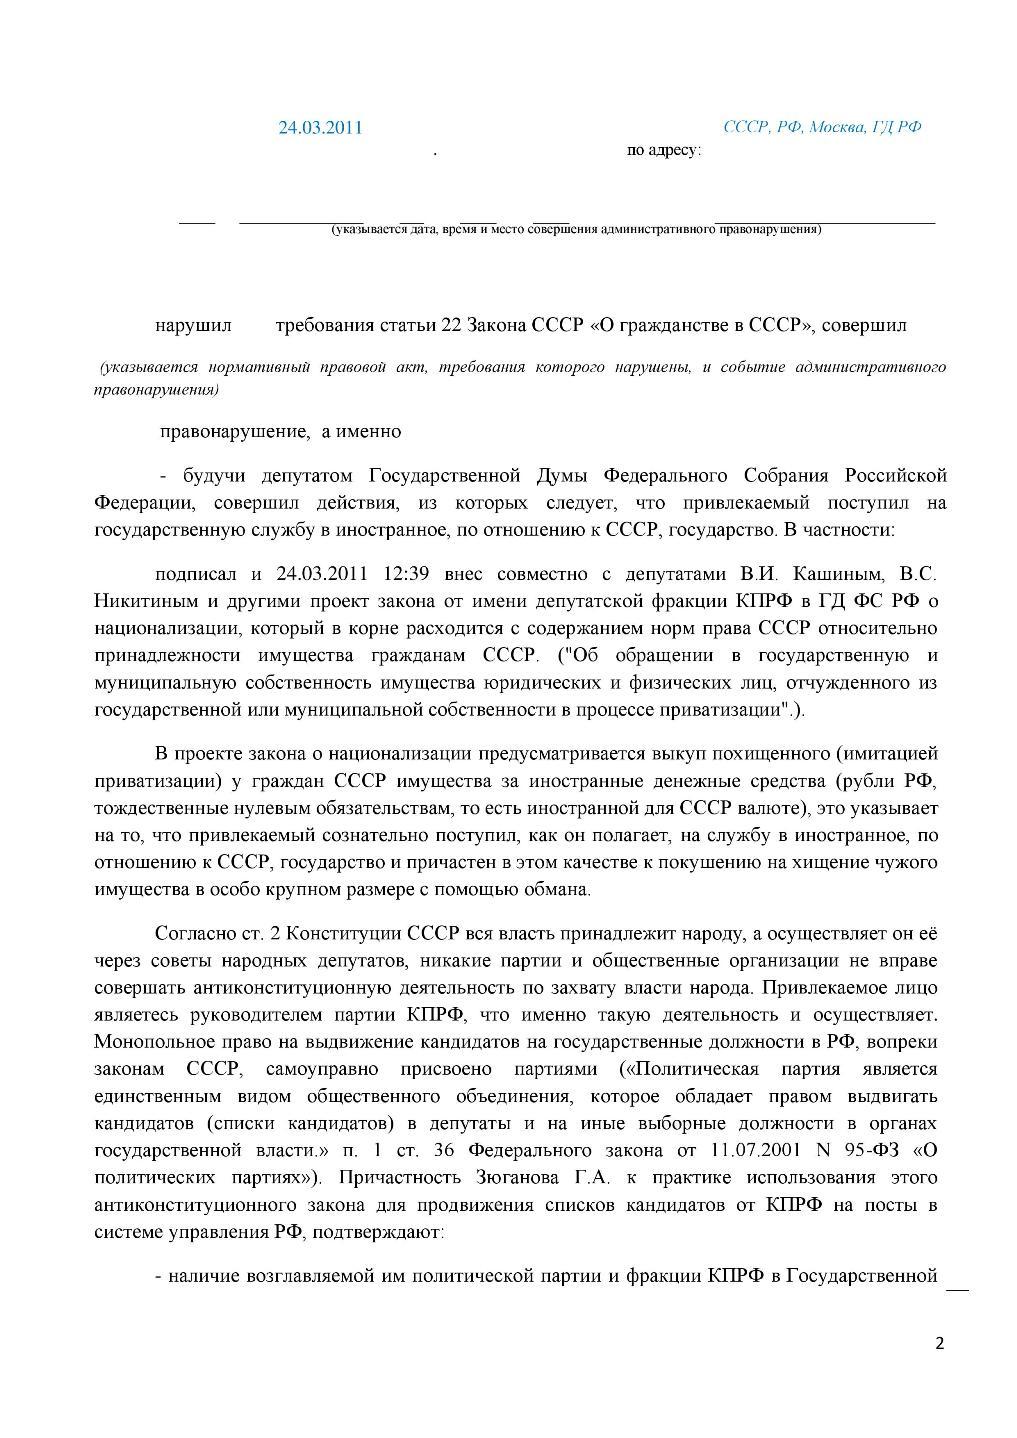 http://narsud-sssr.ru/wp-content/uploads/2015/08/page2.jpg